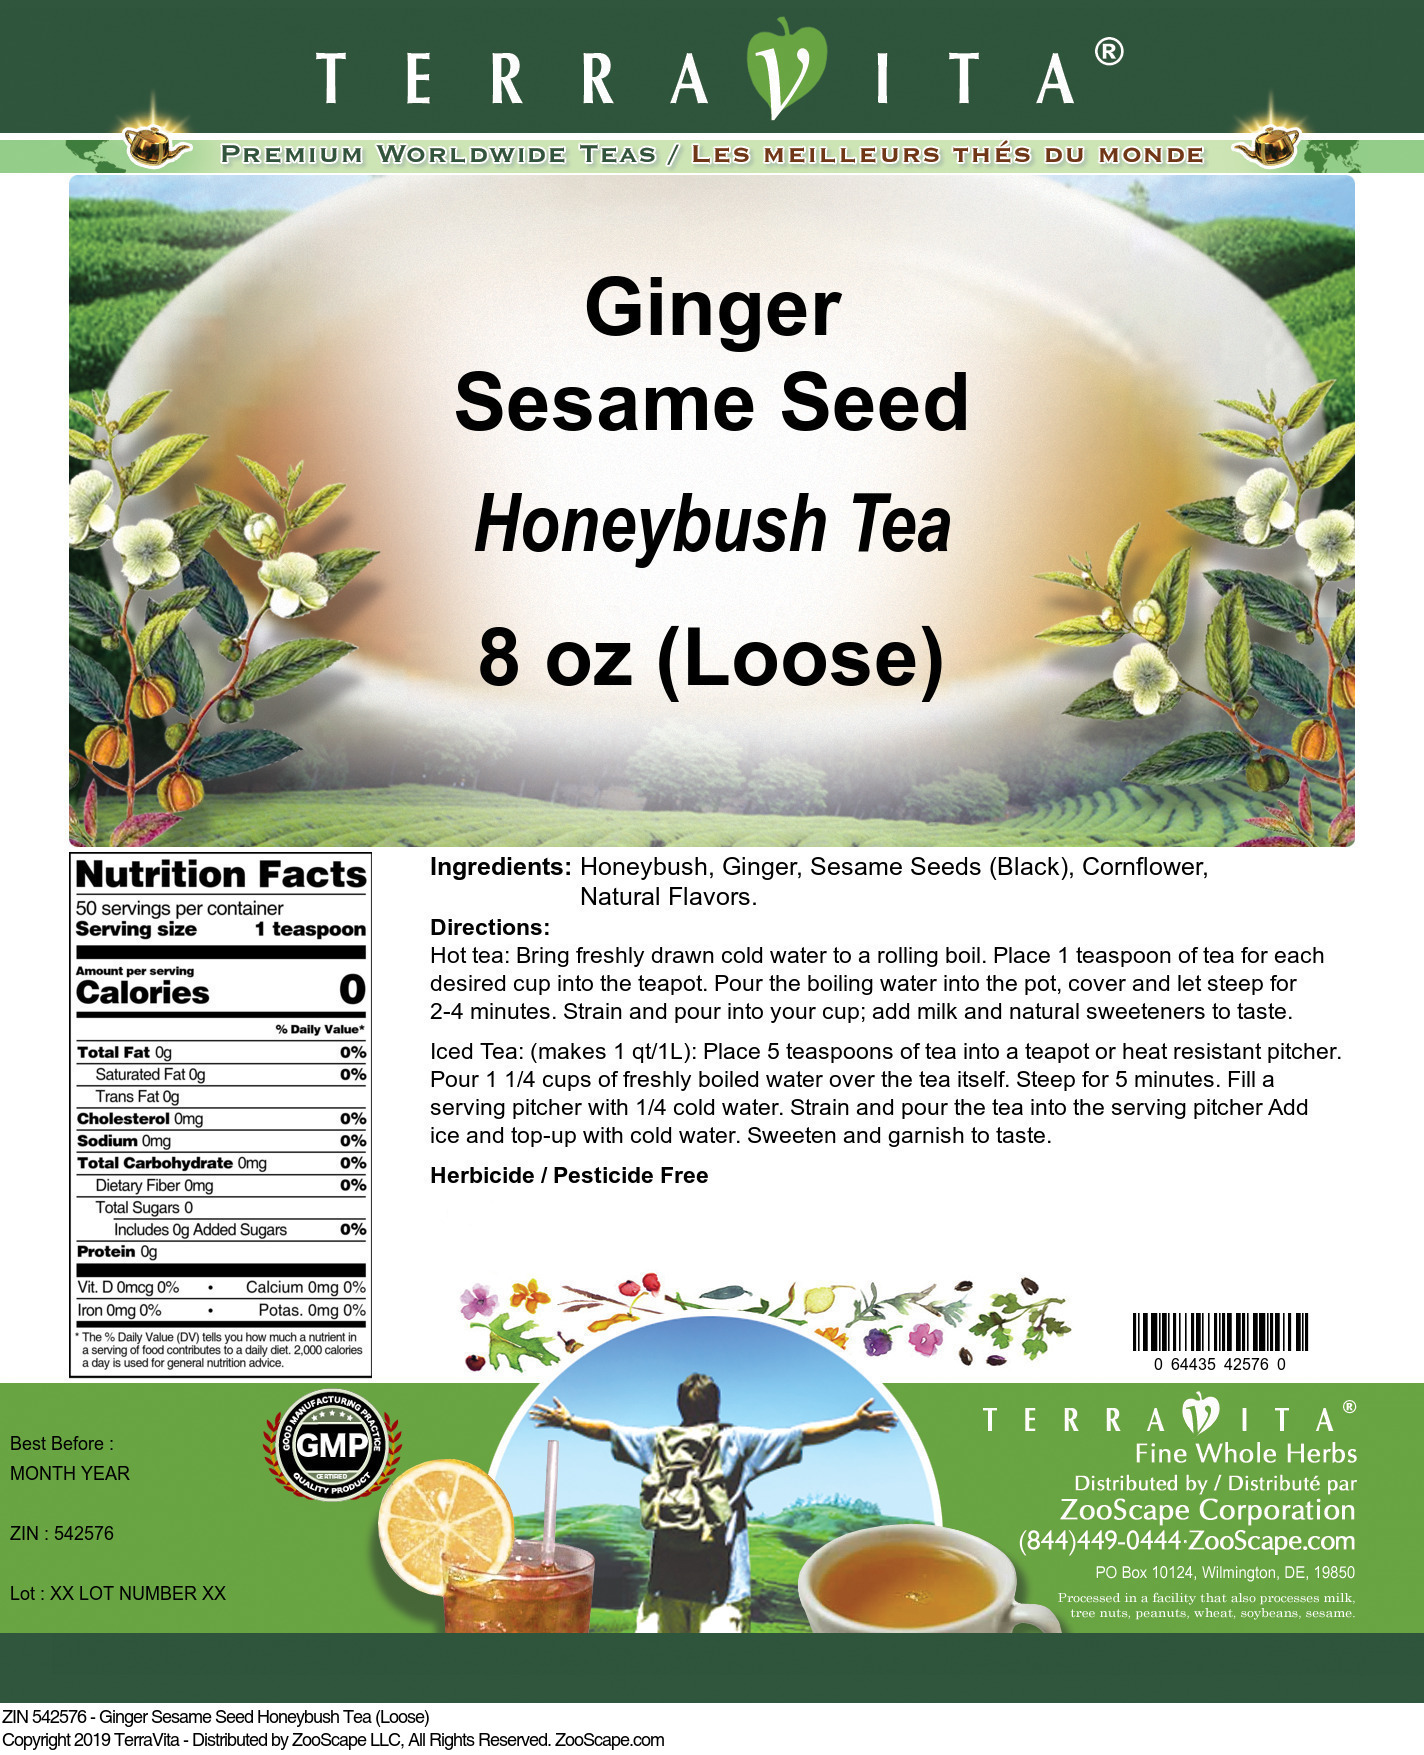 Ginger Sesame Seed Honeybush Tea (Loose)